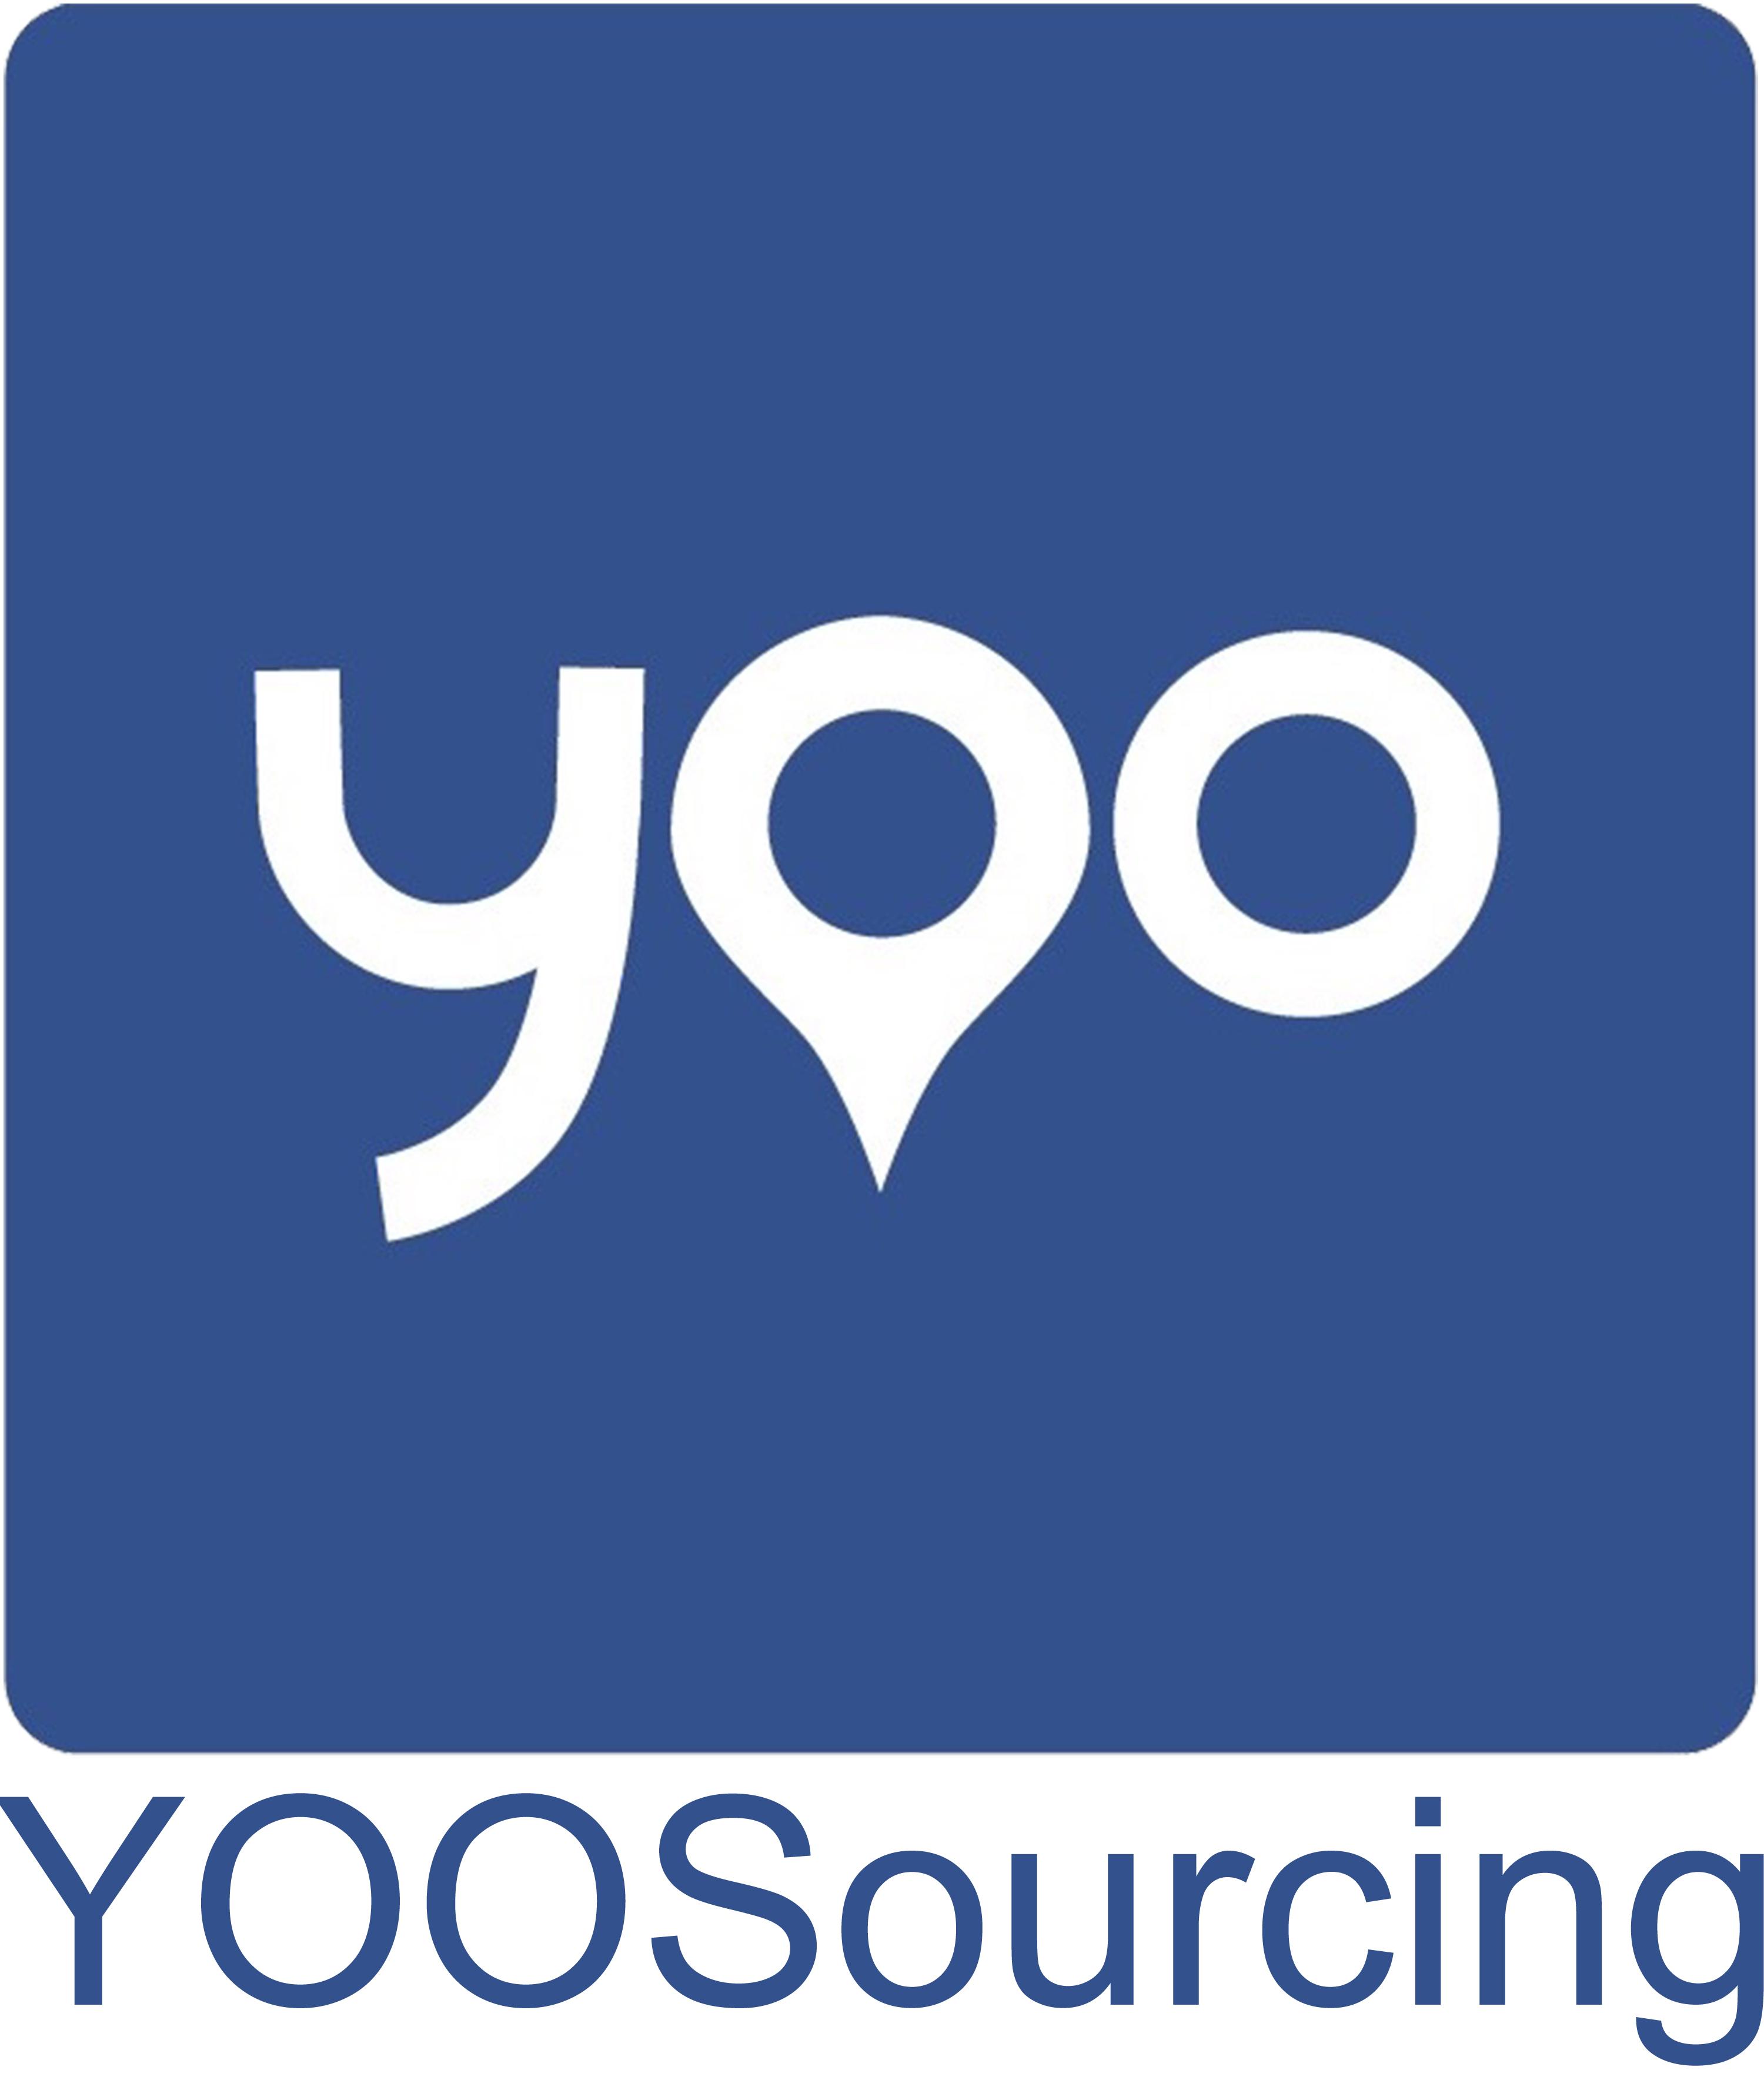 Yoosourcing